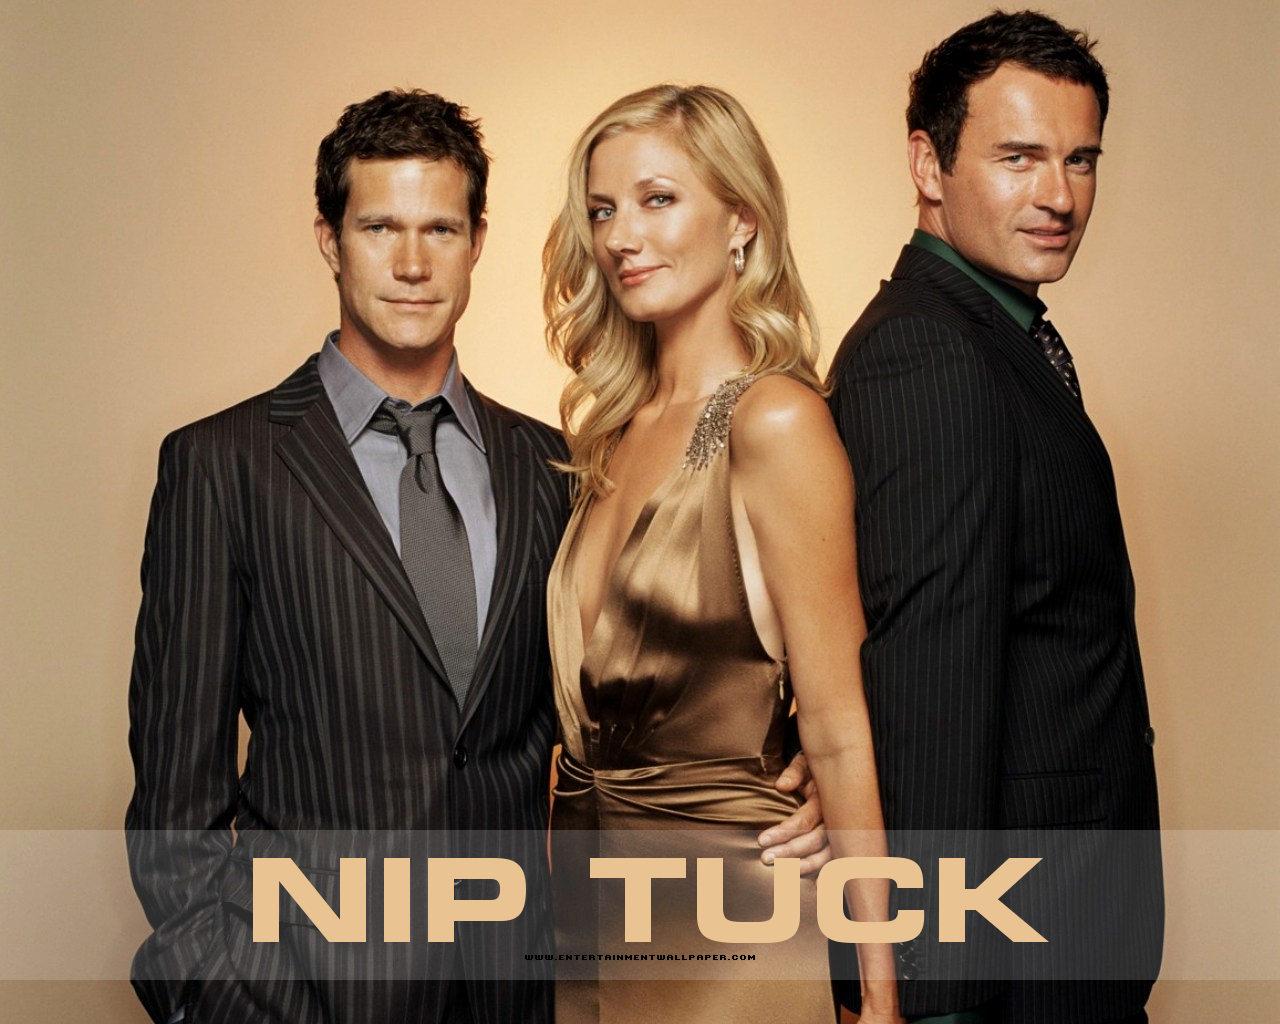 Nip Tuck Random Episode Generator